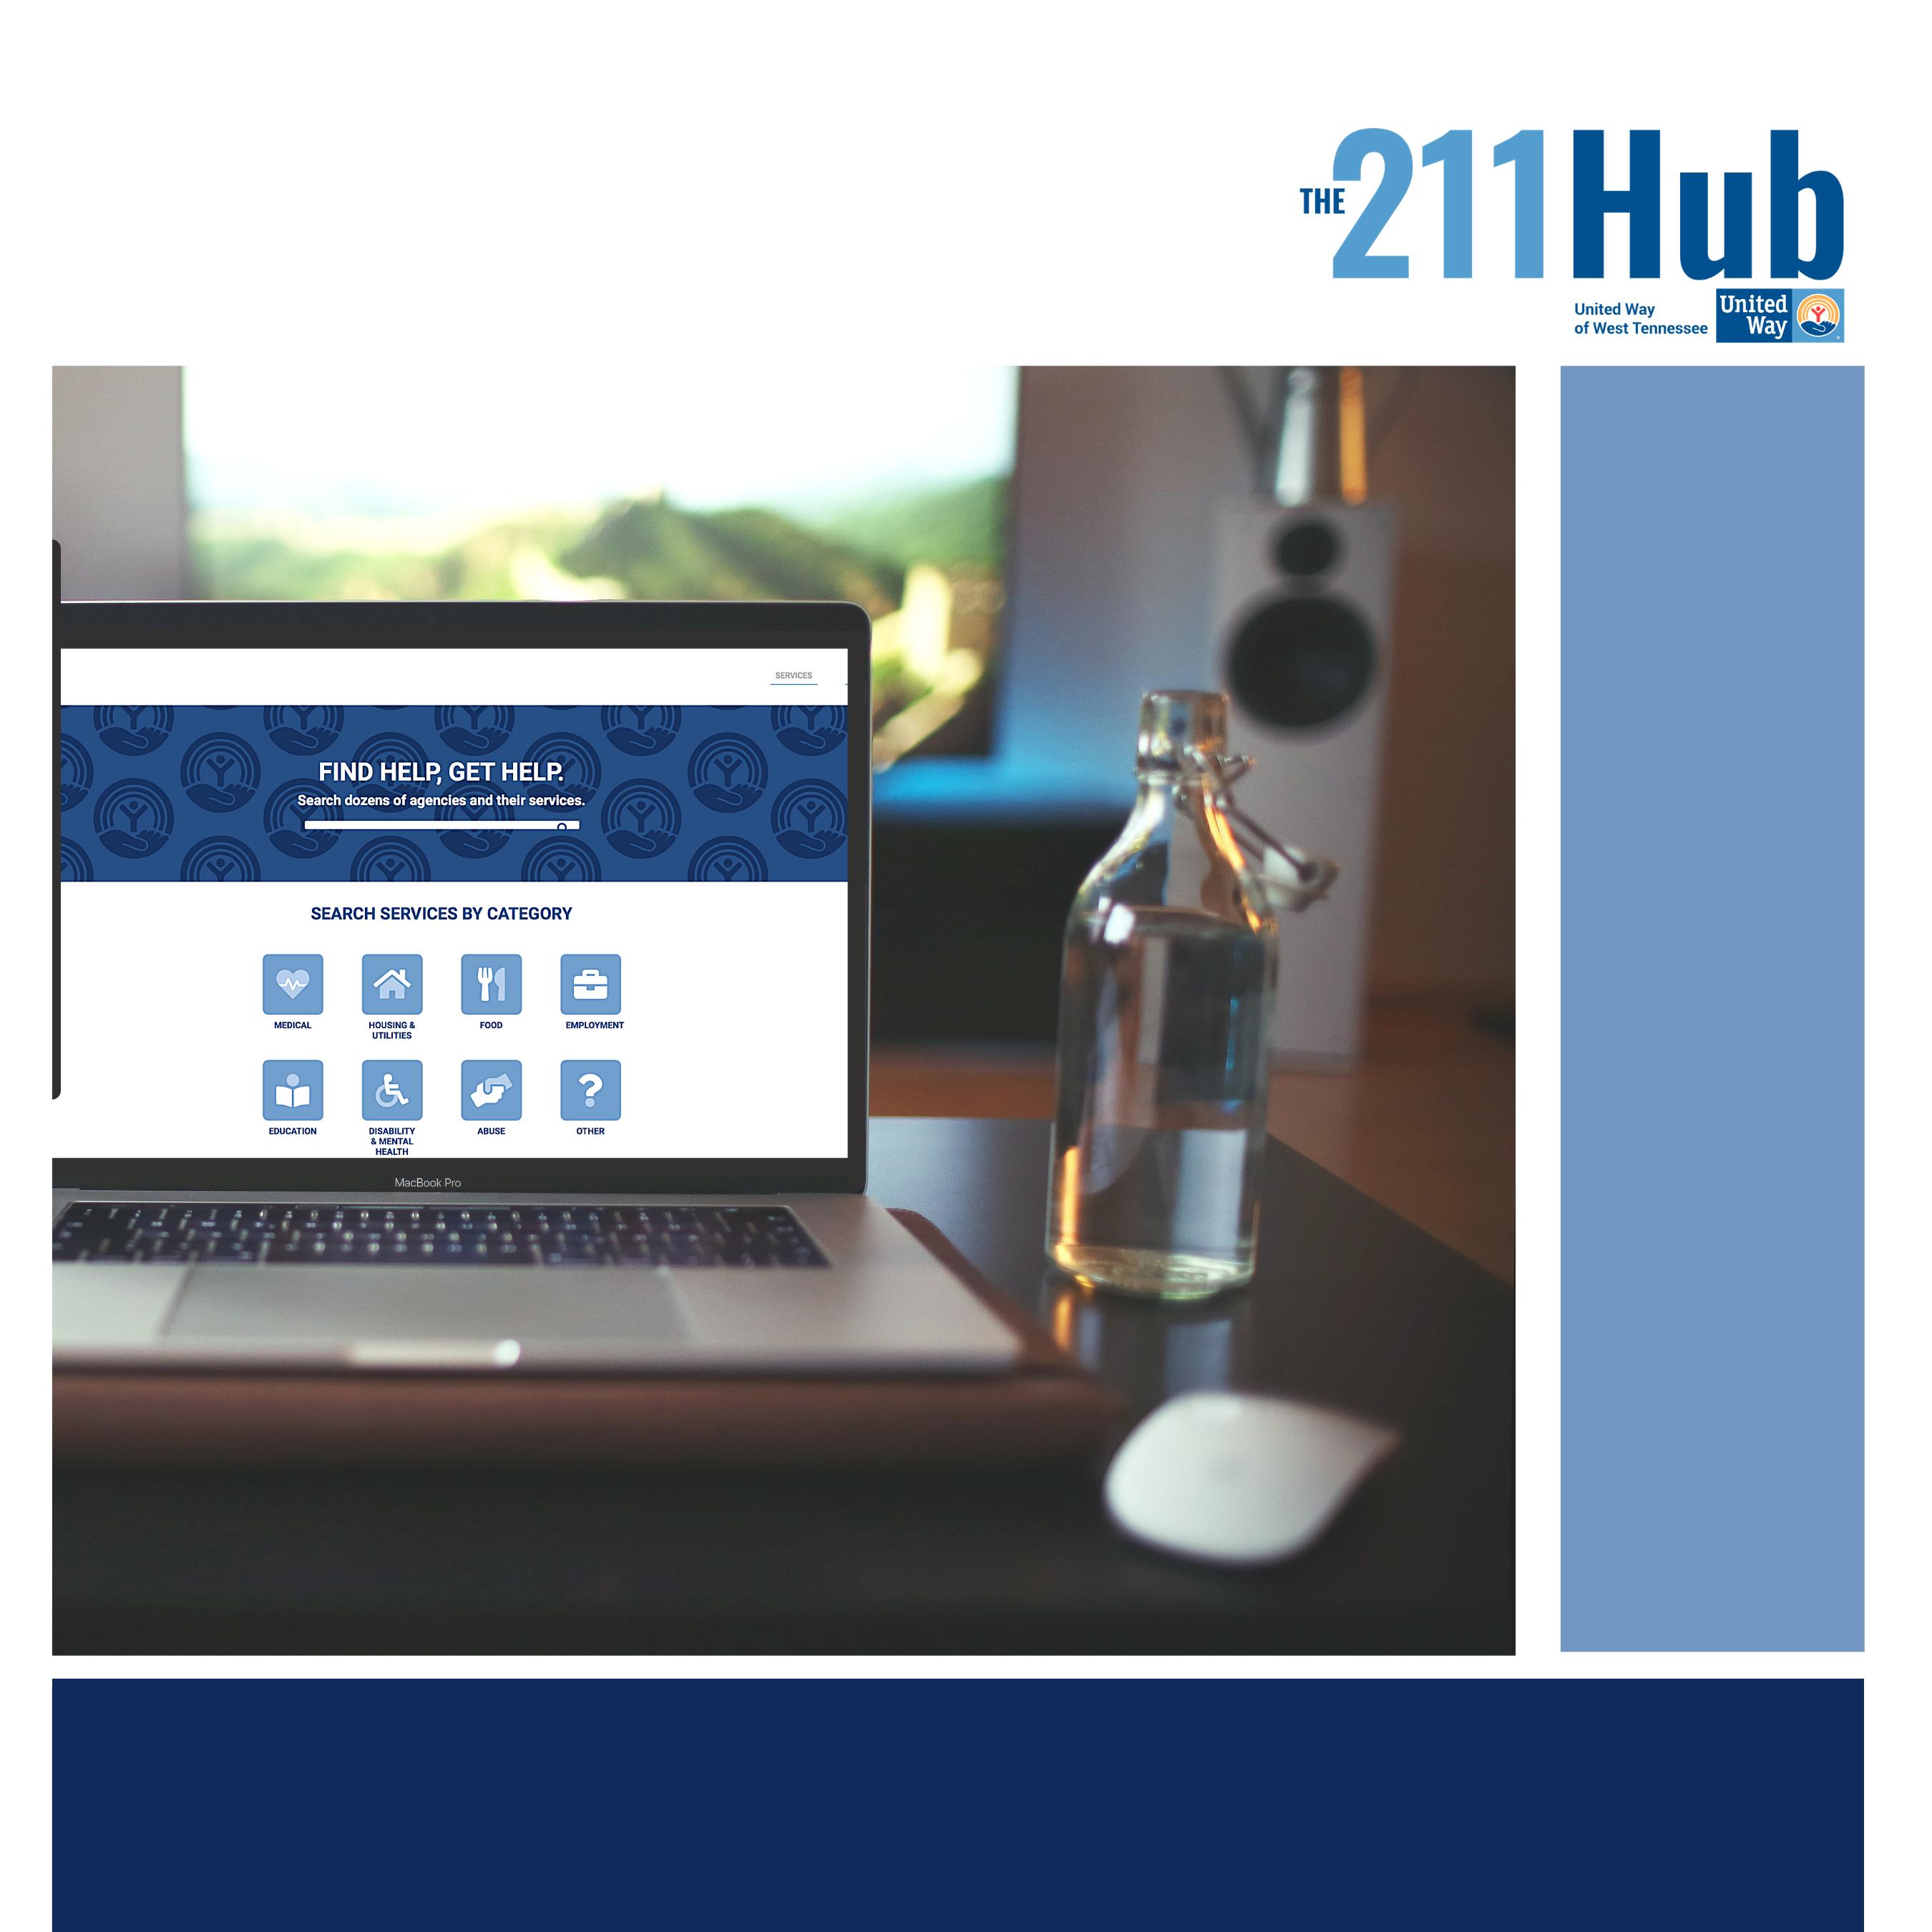 The 211 Hub